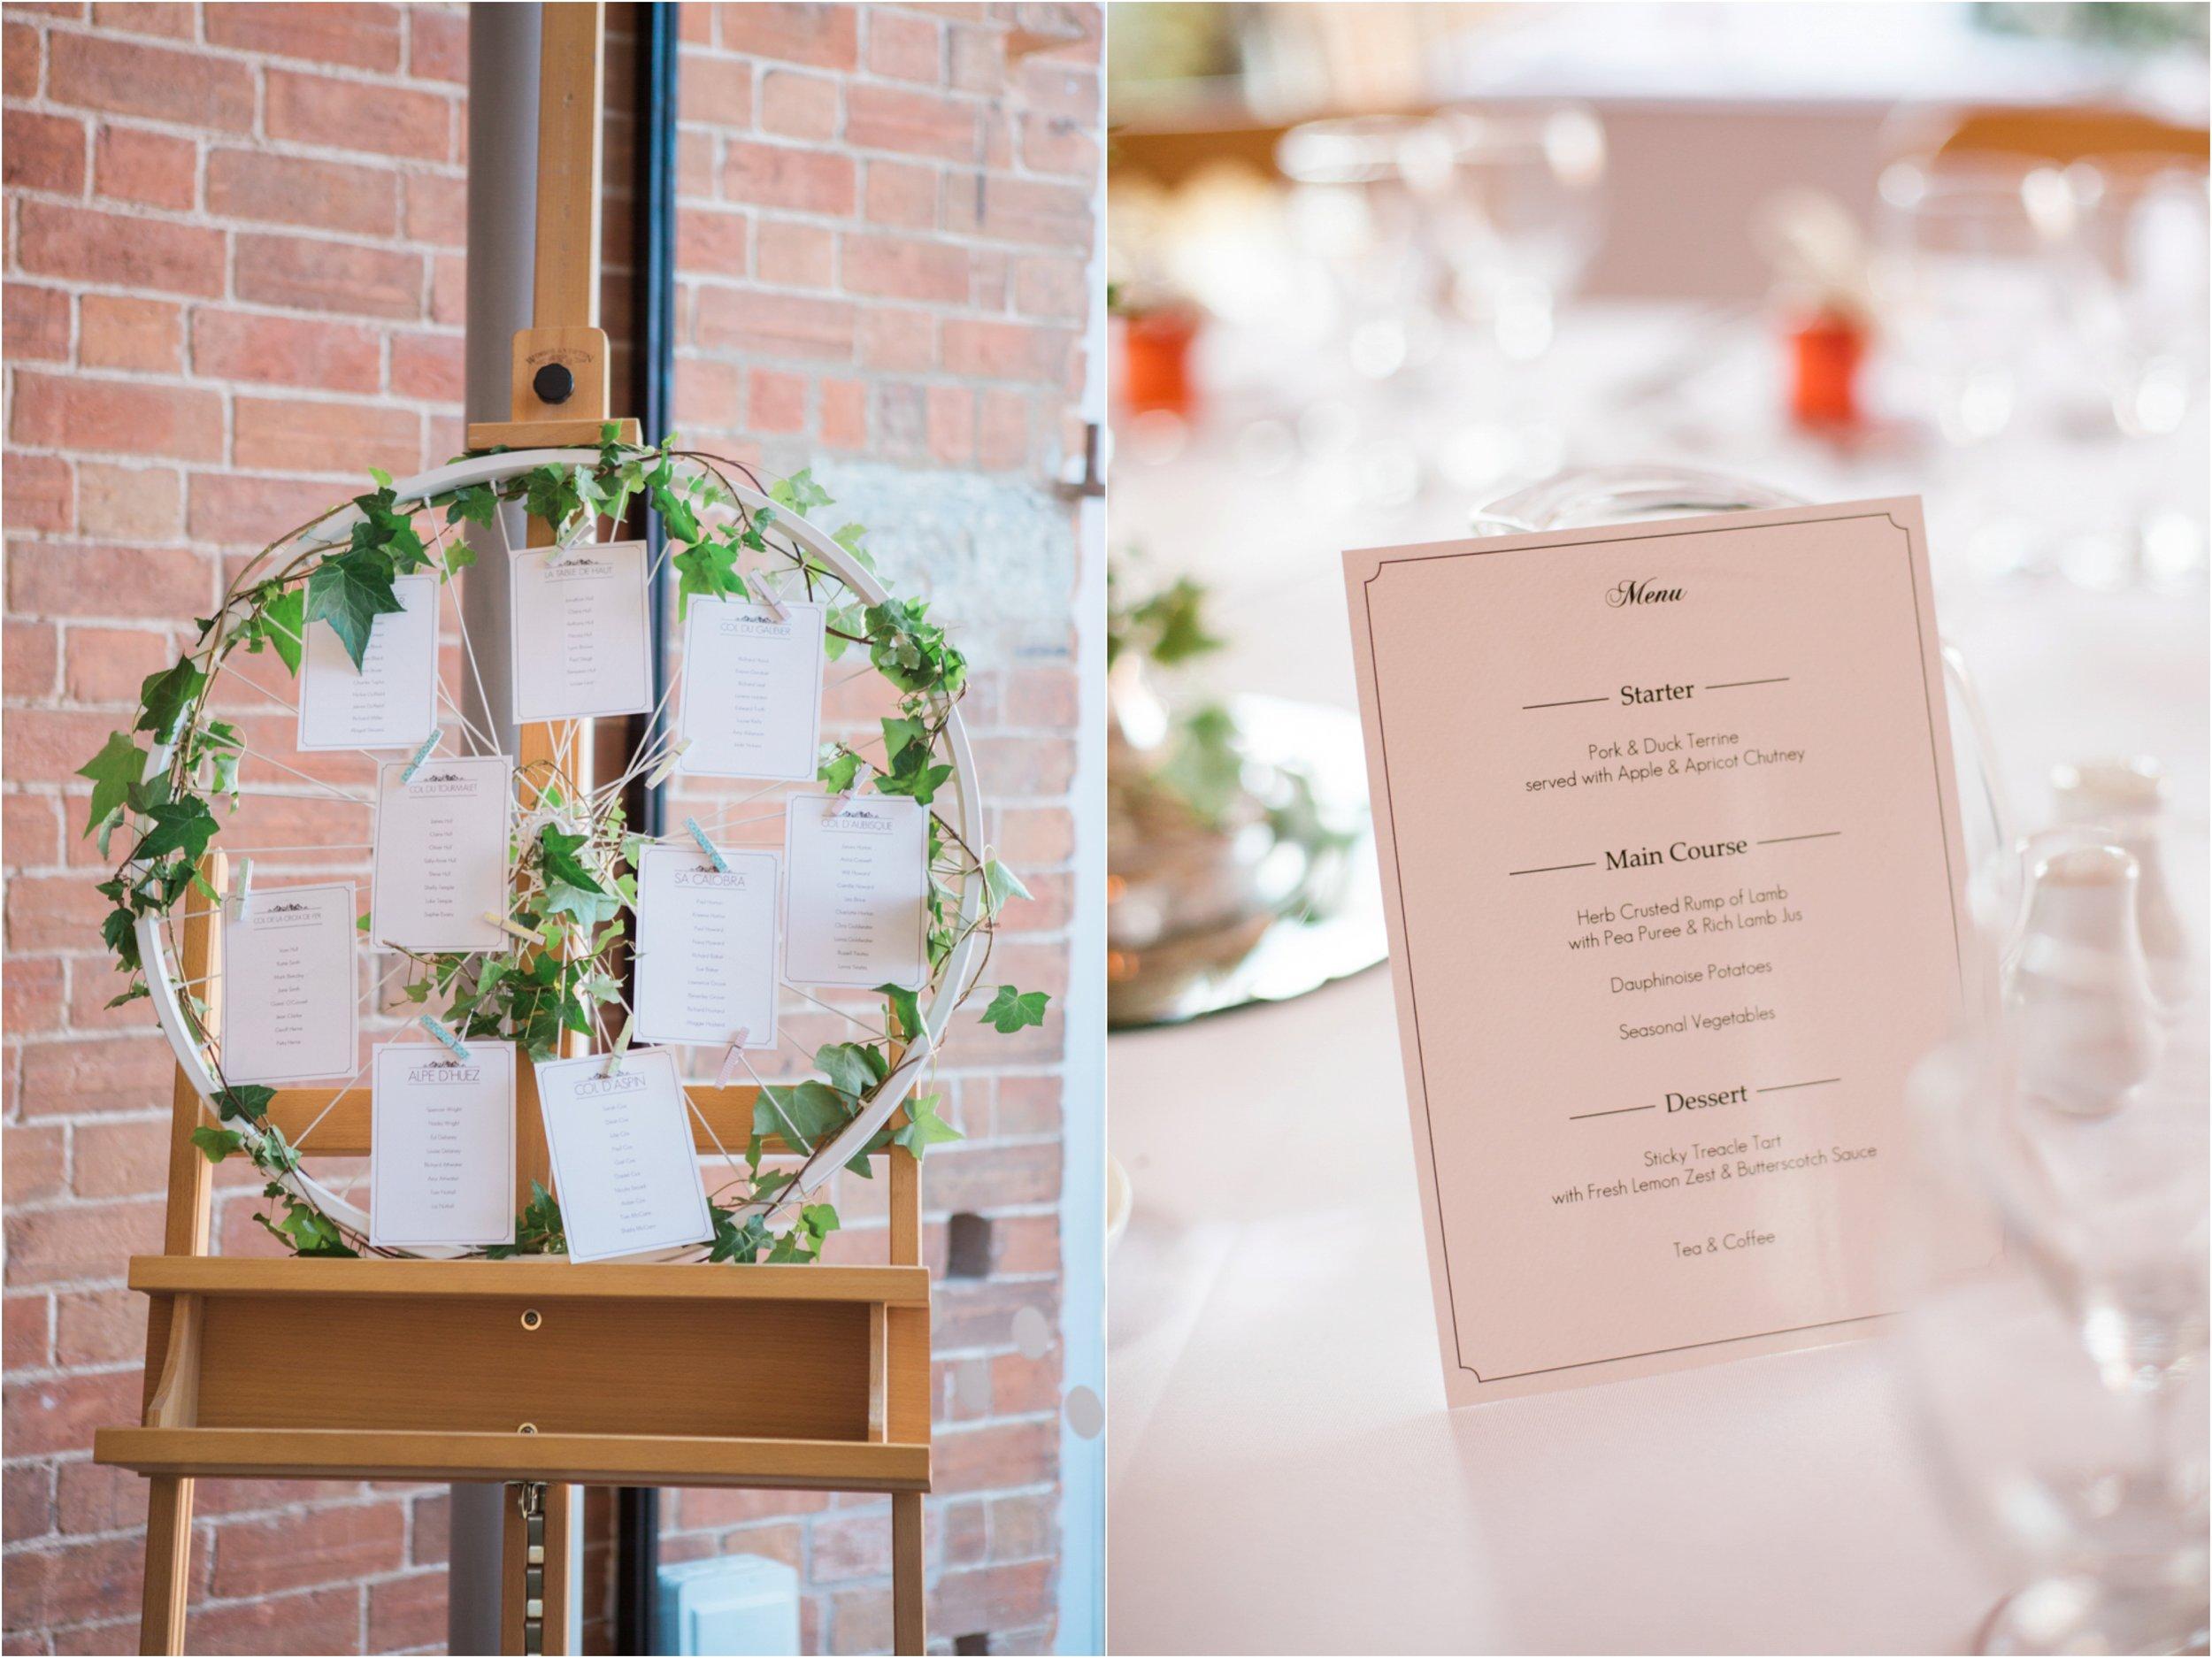 Sophie Evans Photography, Claire & John, Swallows Nest Barn Wedding, Warwickshire Wedding Photographer-110.jpg